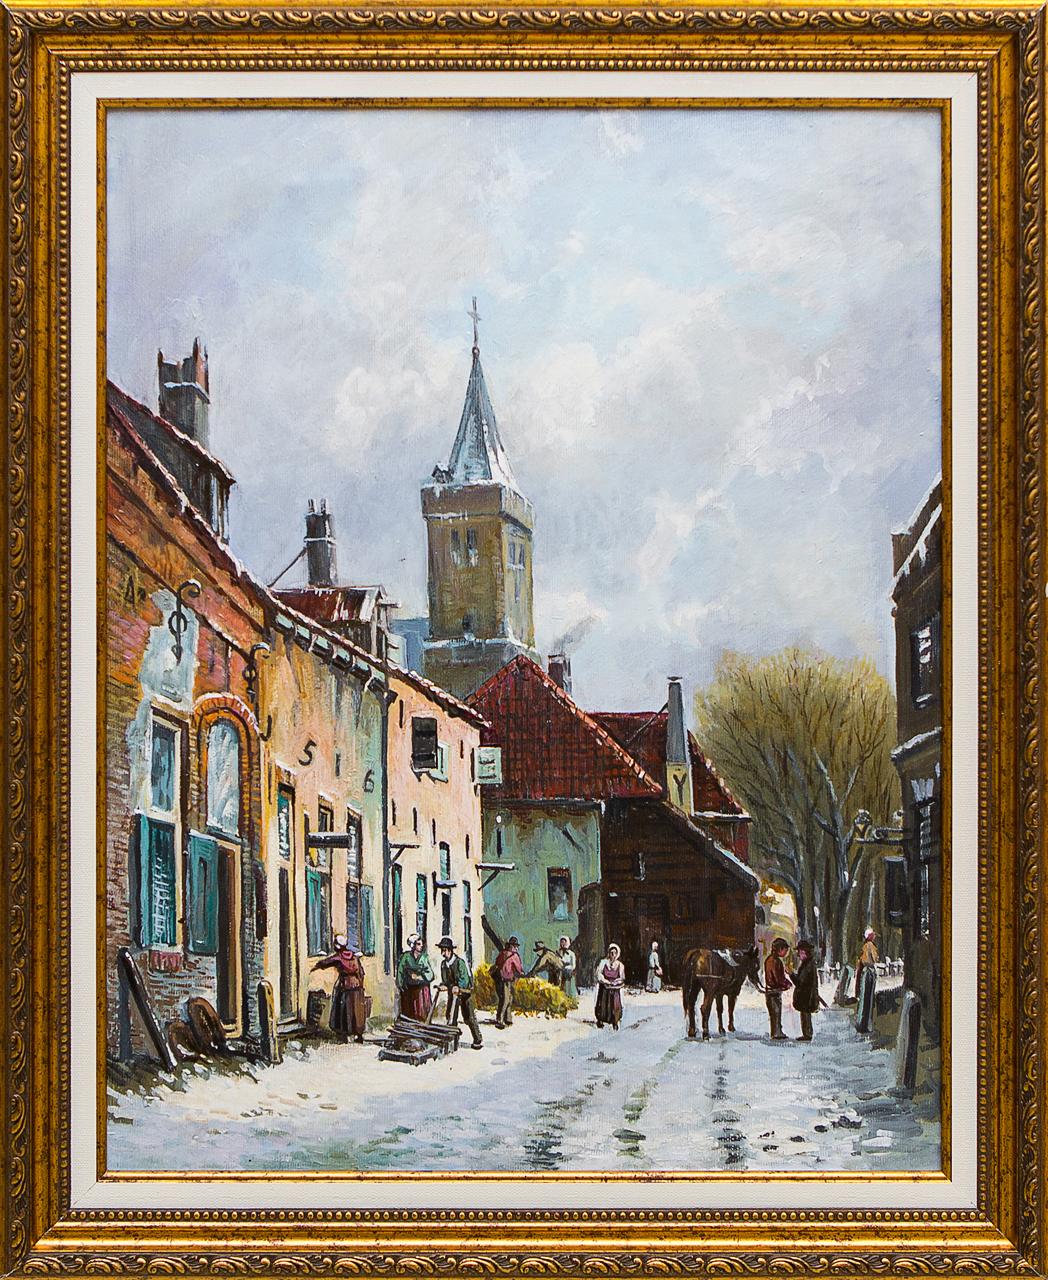 Картина маслом Уголок Голландии Воробьёв картина маслом гуляки воробьёв